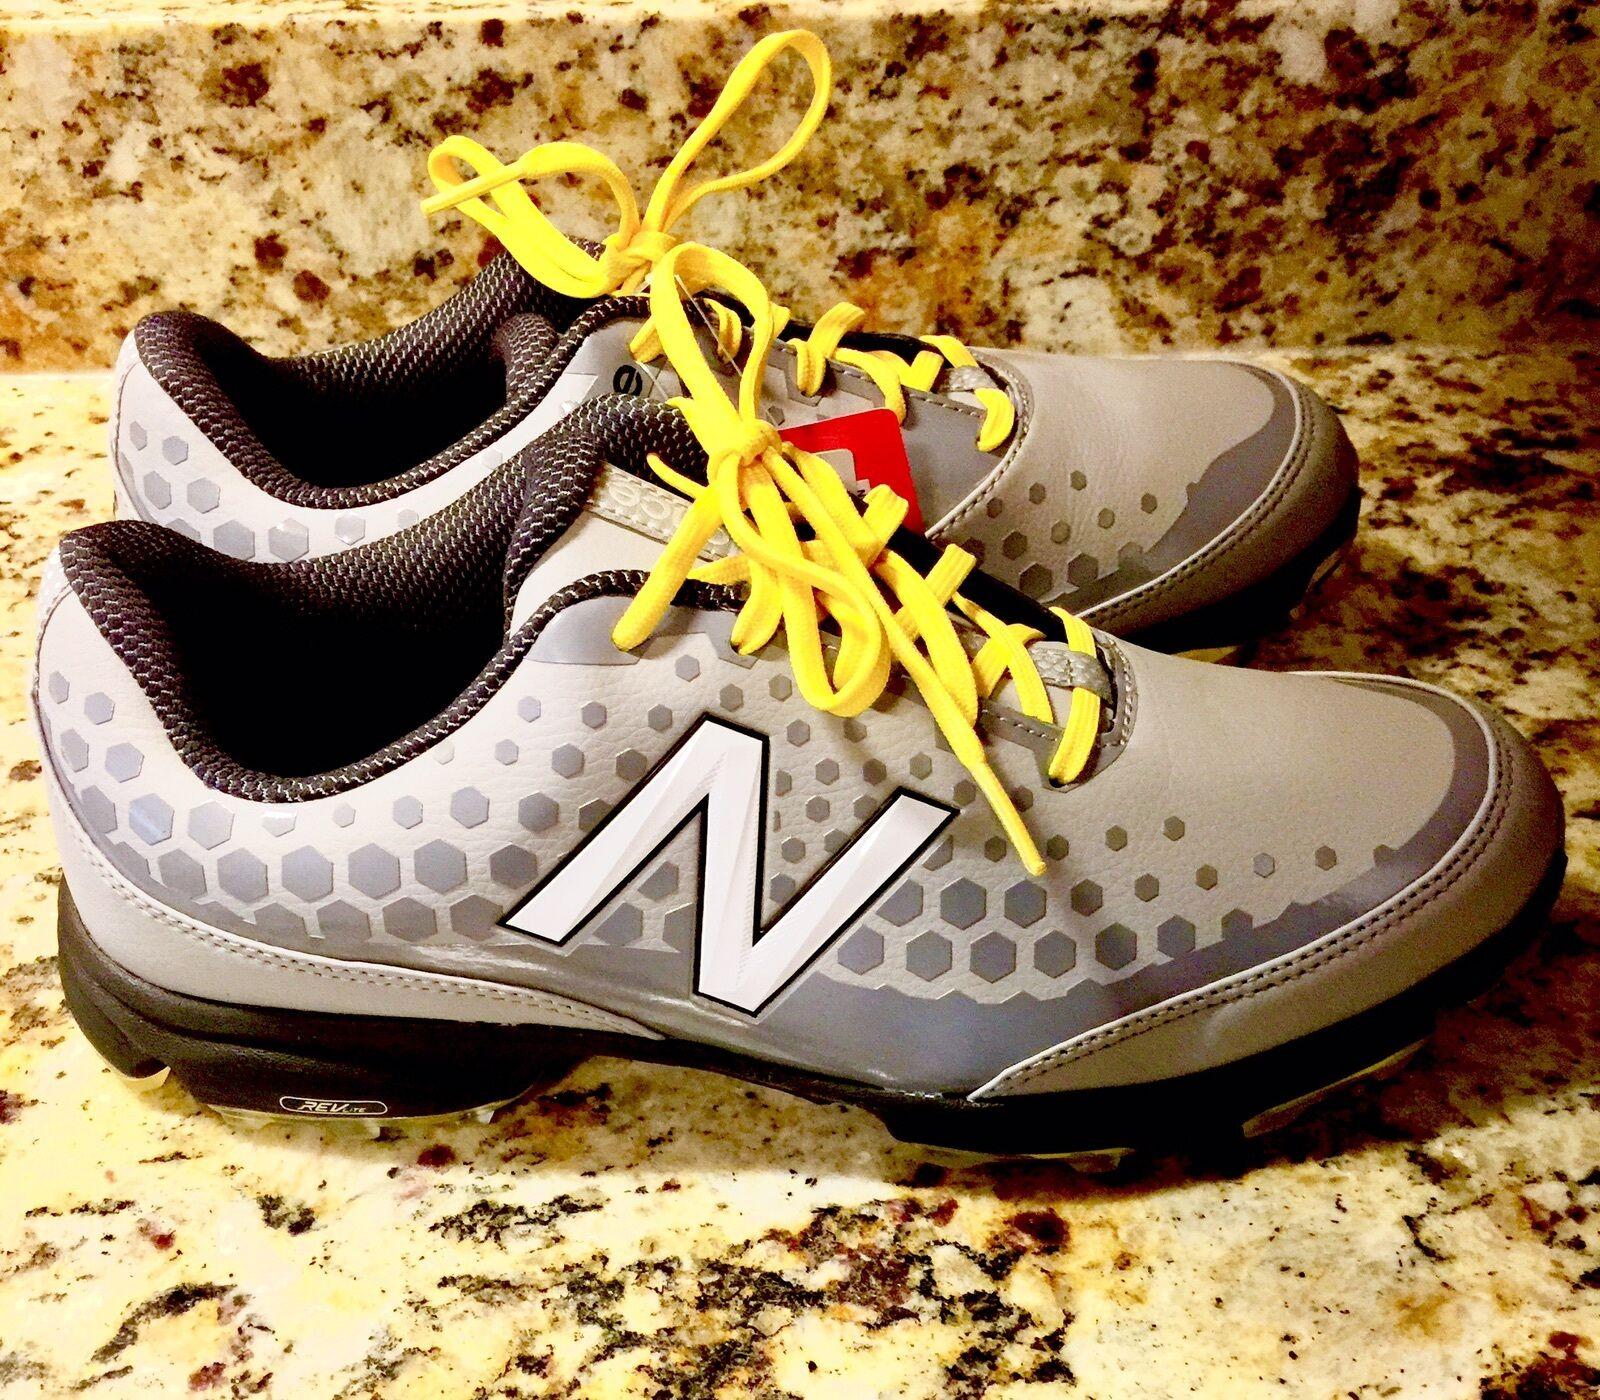 New Balance NBG2002 Gray Men's Leather Golf Shoe Size 9 NWOB